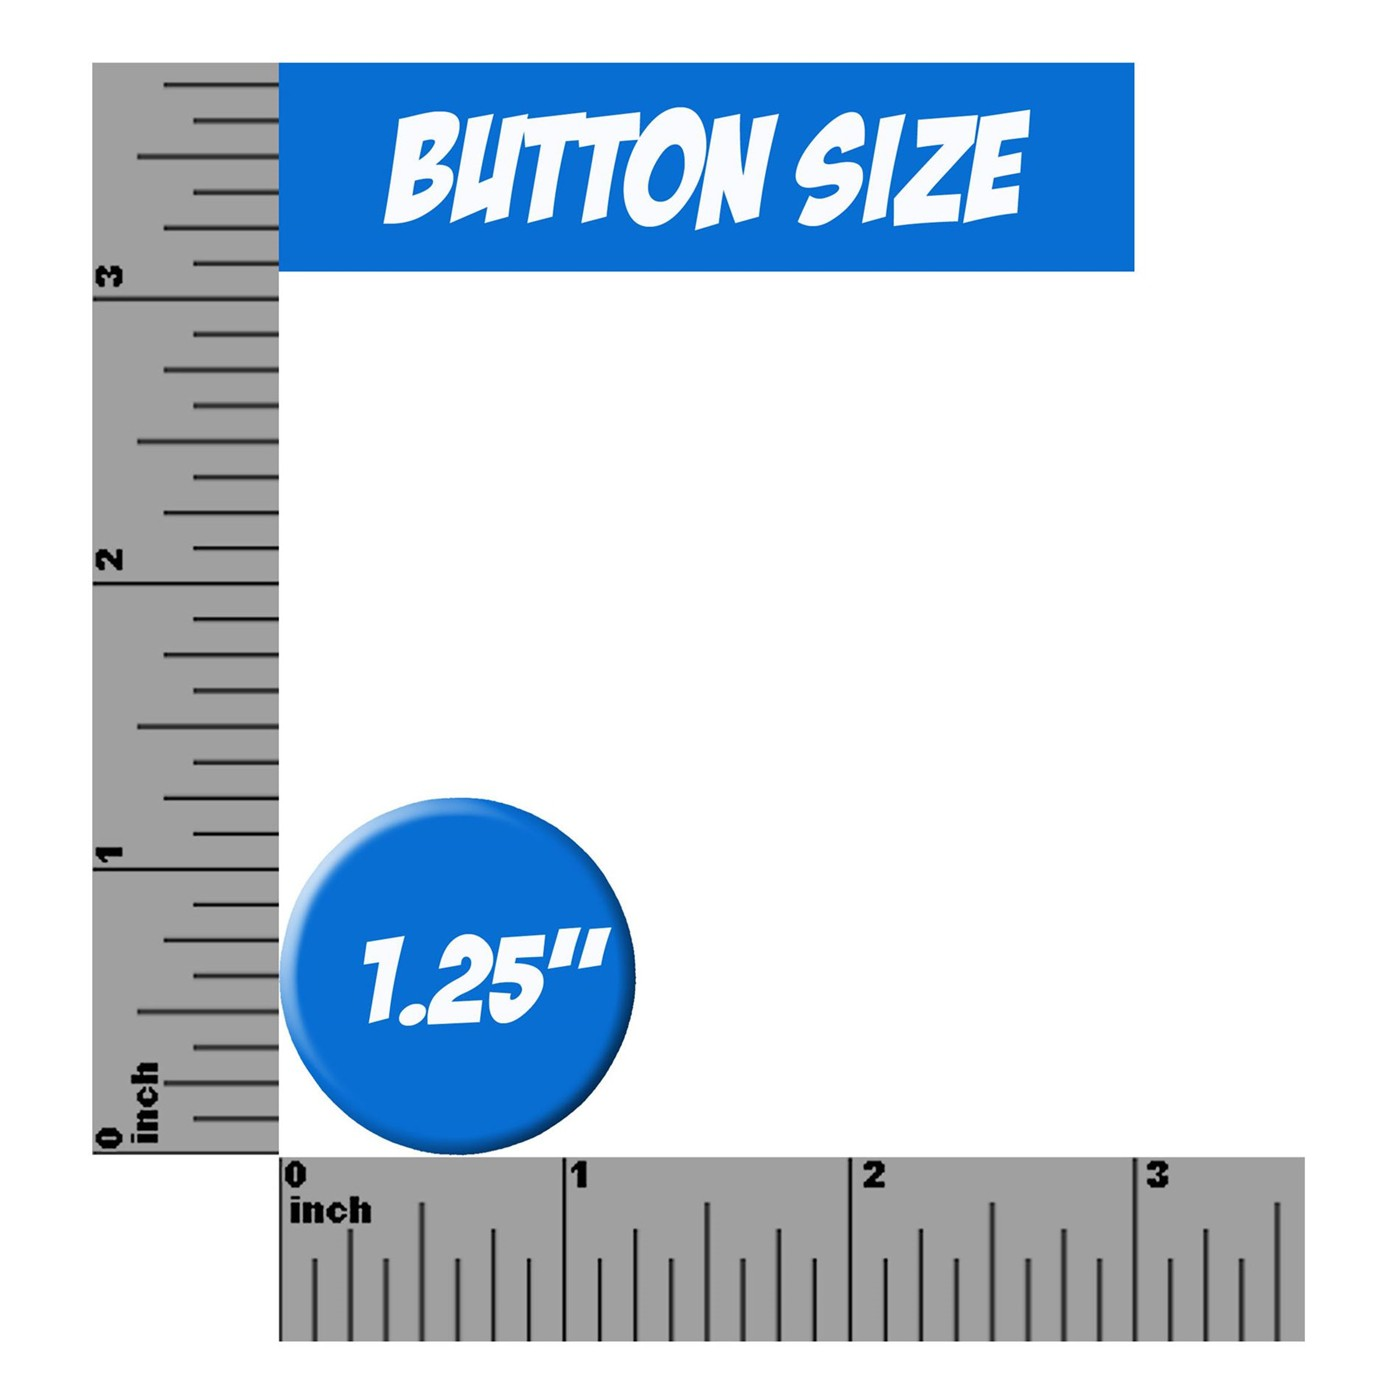 BattlePug Charge Button